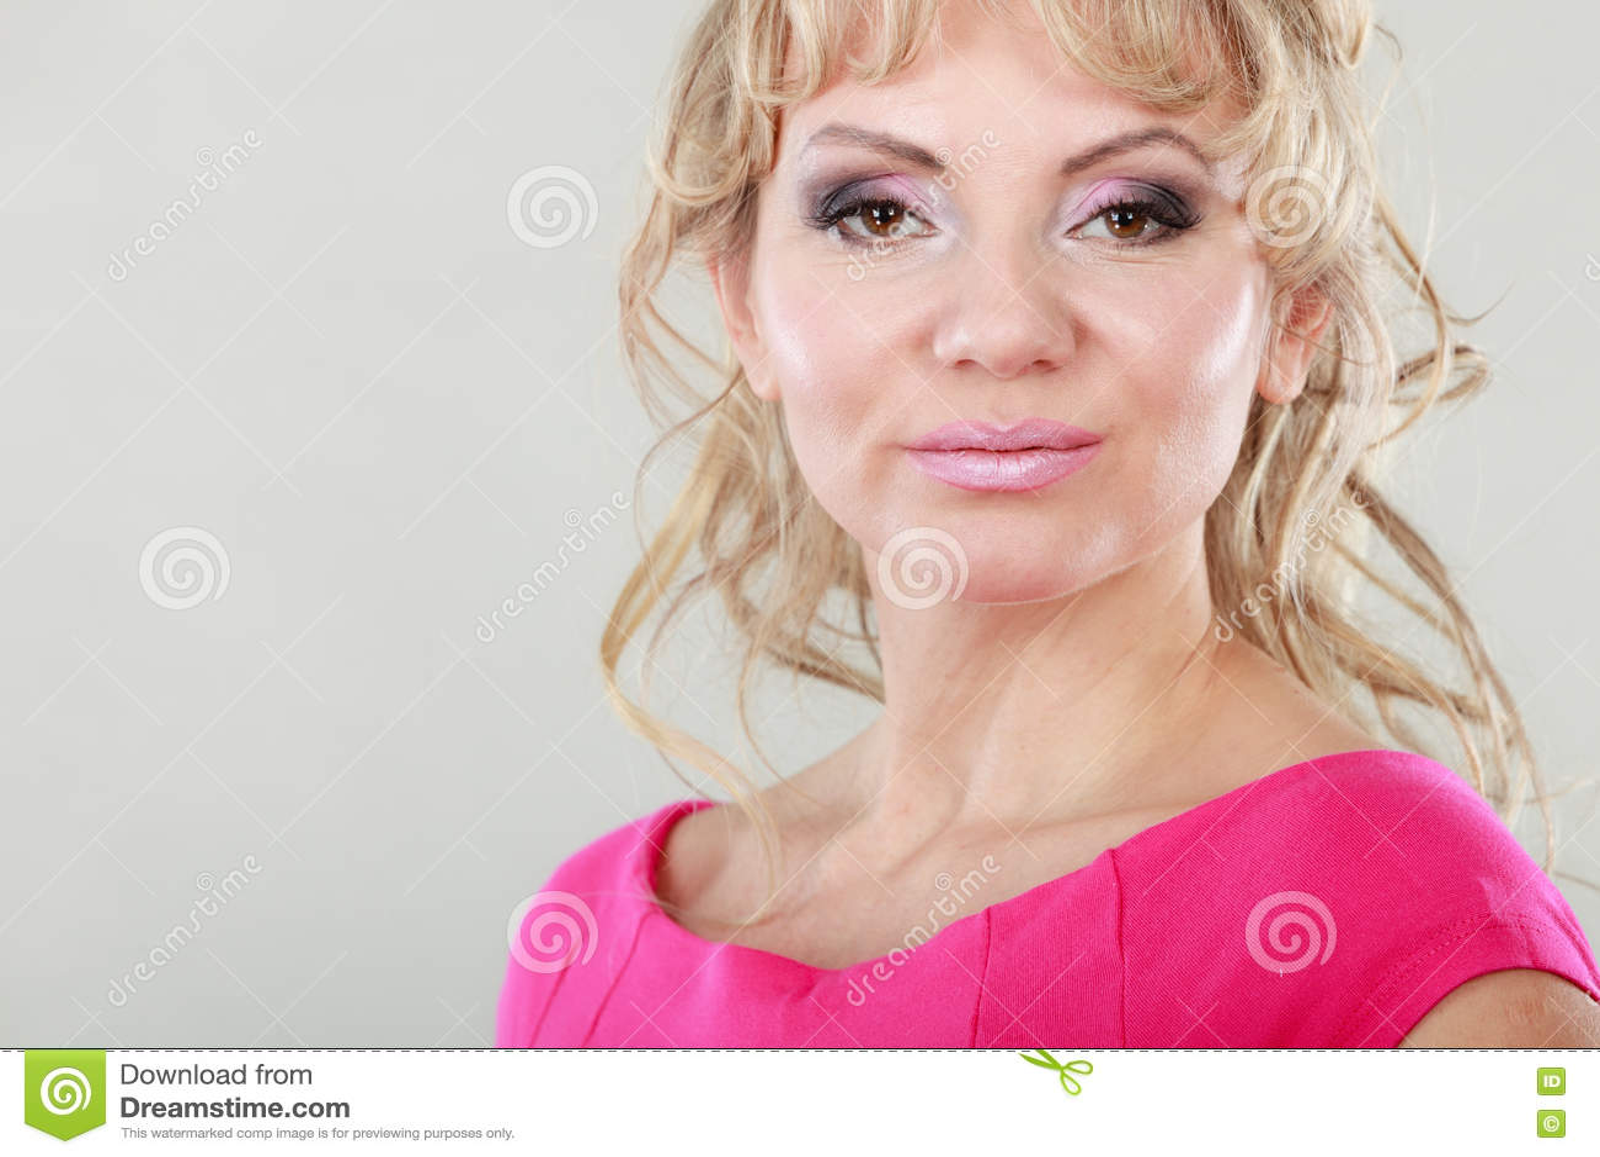 Curly blonde mature